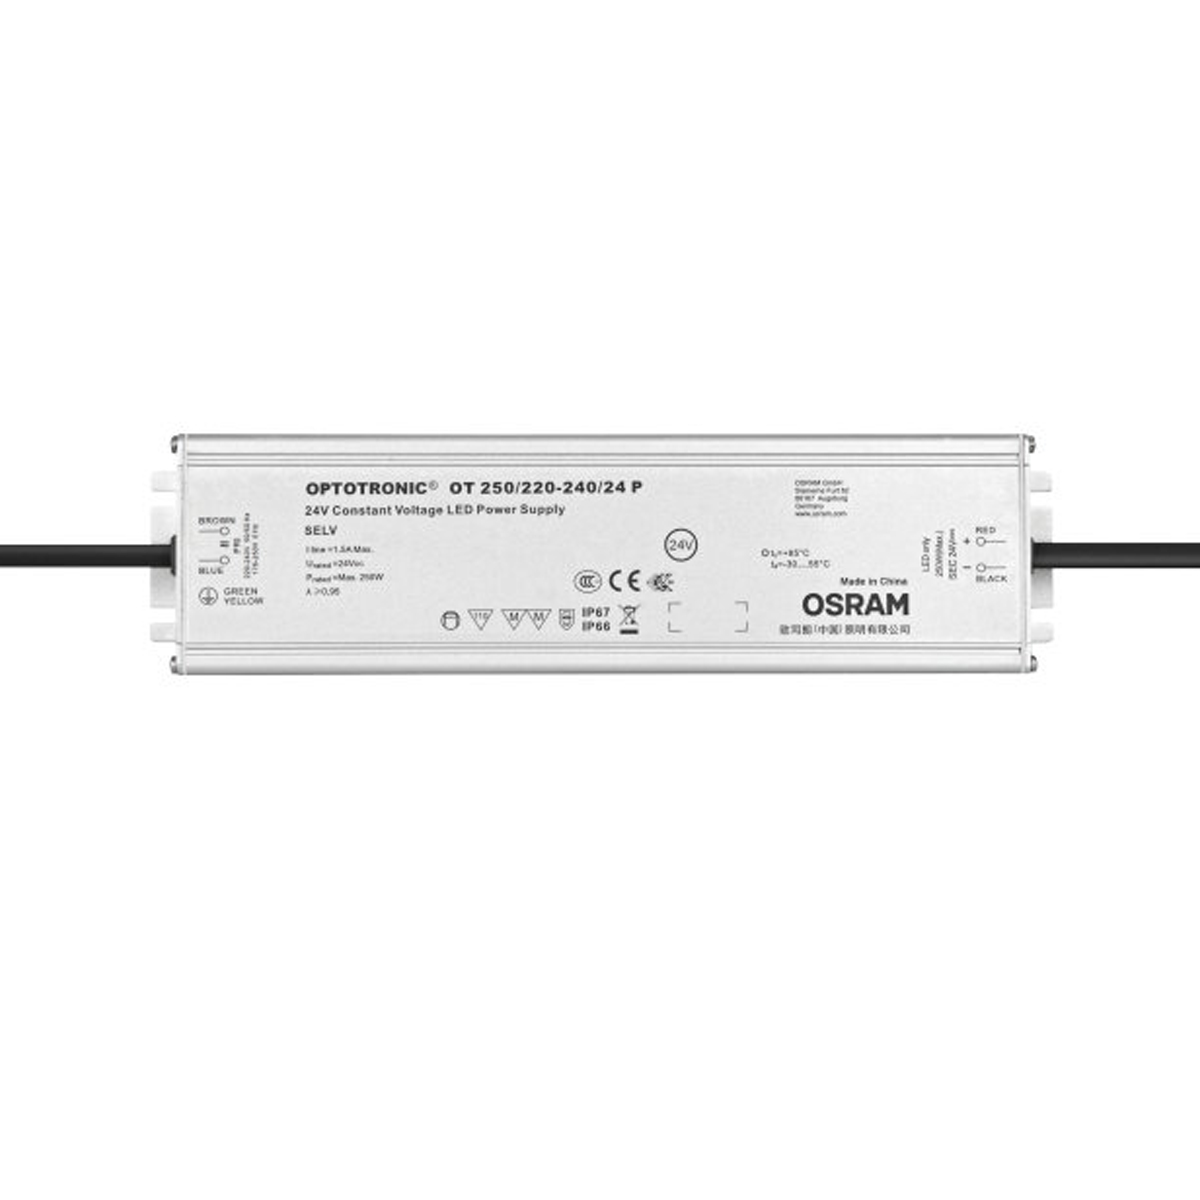 OSRAM OPTOTRONIC® OT 250//220-240//24P Konstantspannungsversorgung DC 24V-250 Watt